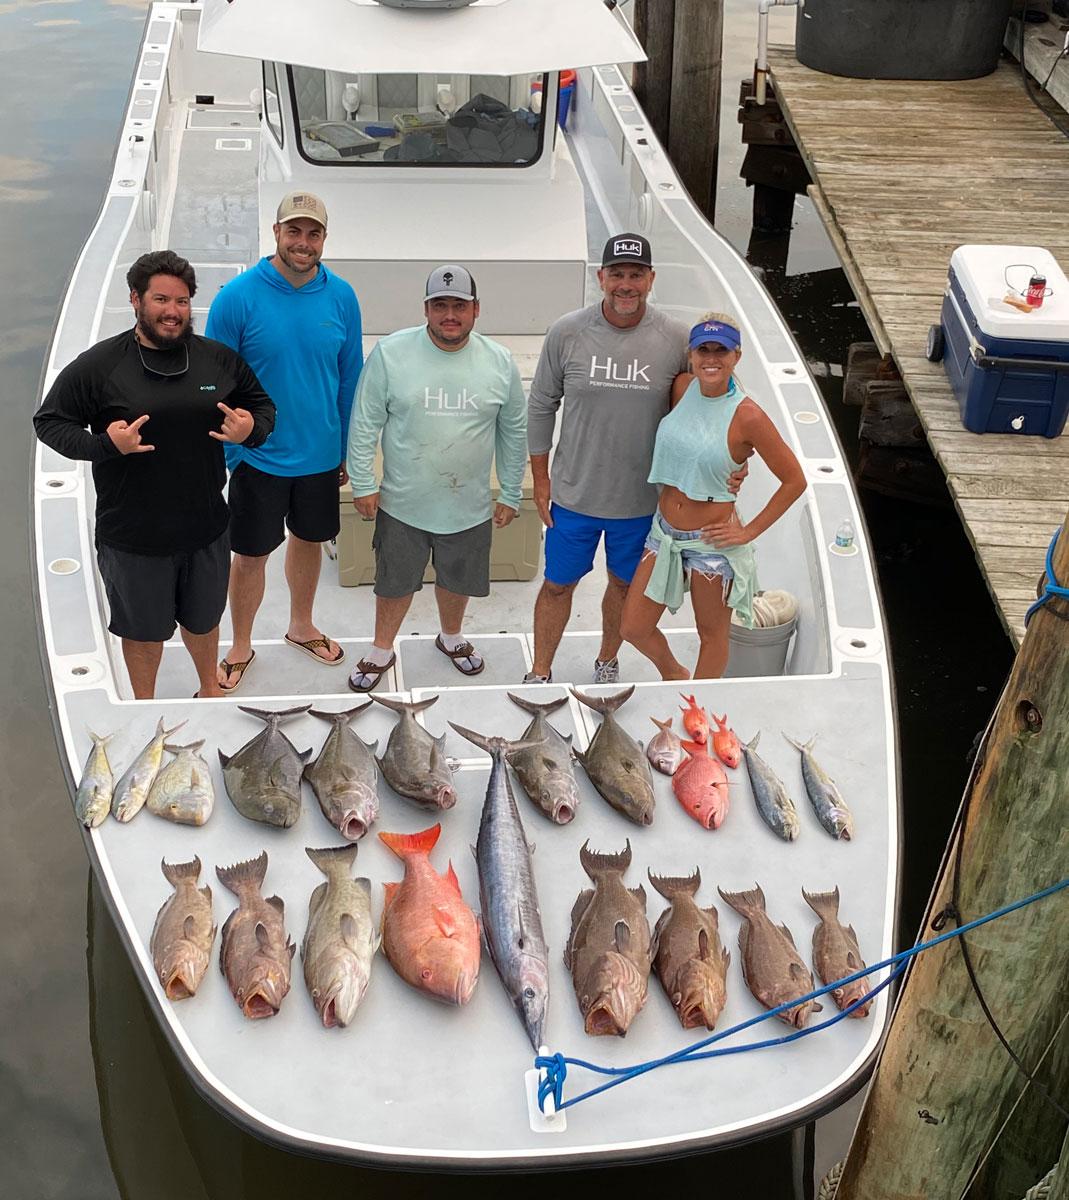 Daniel Rainbolt, Josh Sparks, Micha Rainbolt, Chris Williams and Lisa Schlitzkus after their September trip with Down the Bayou Charters.